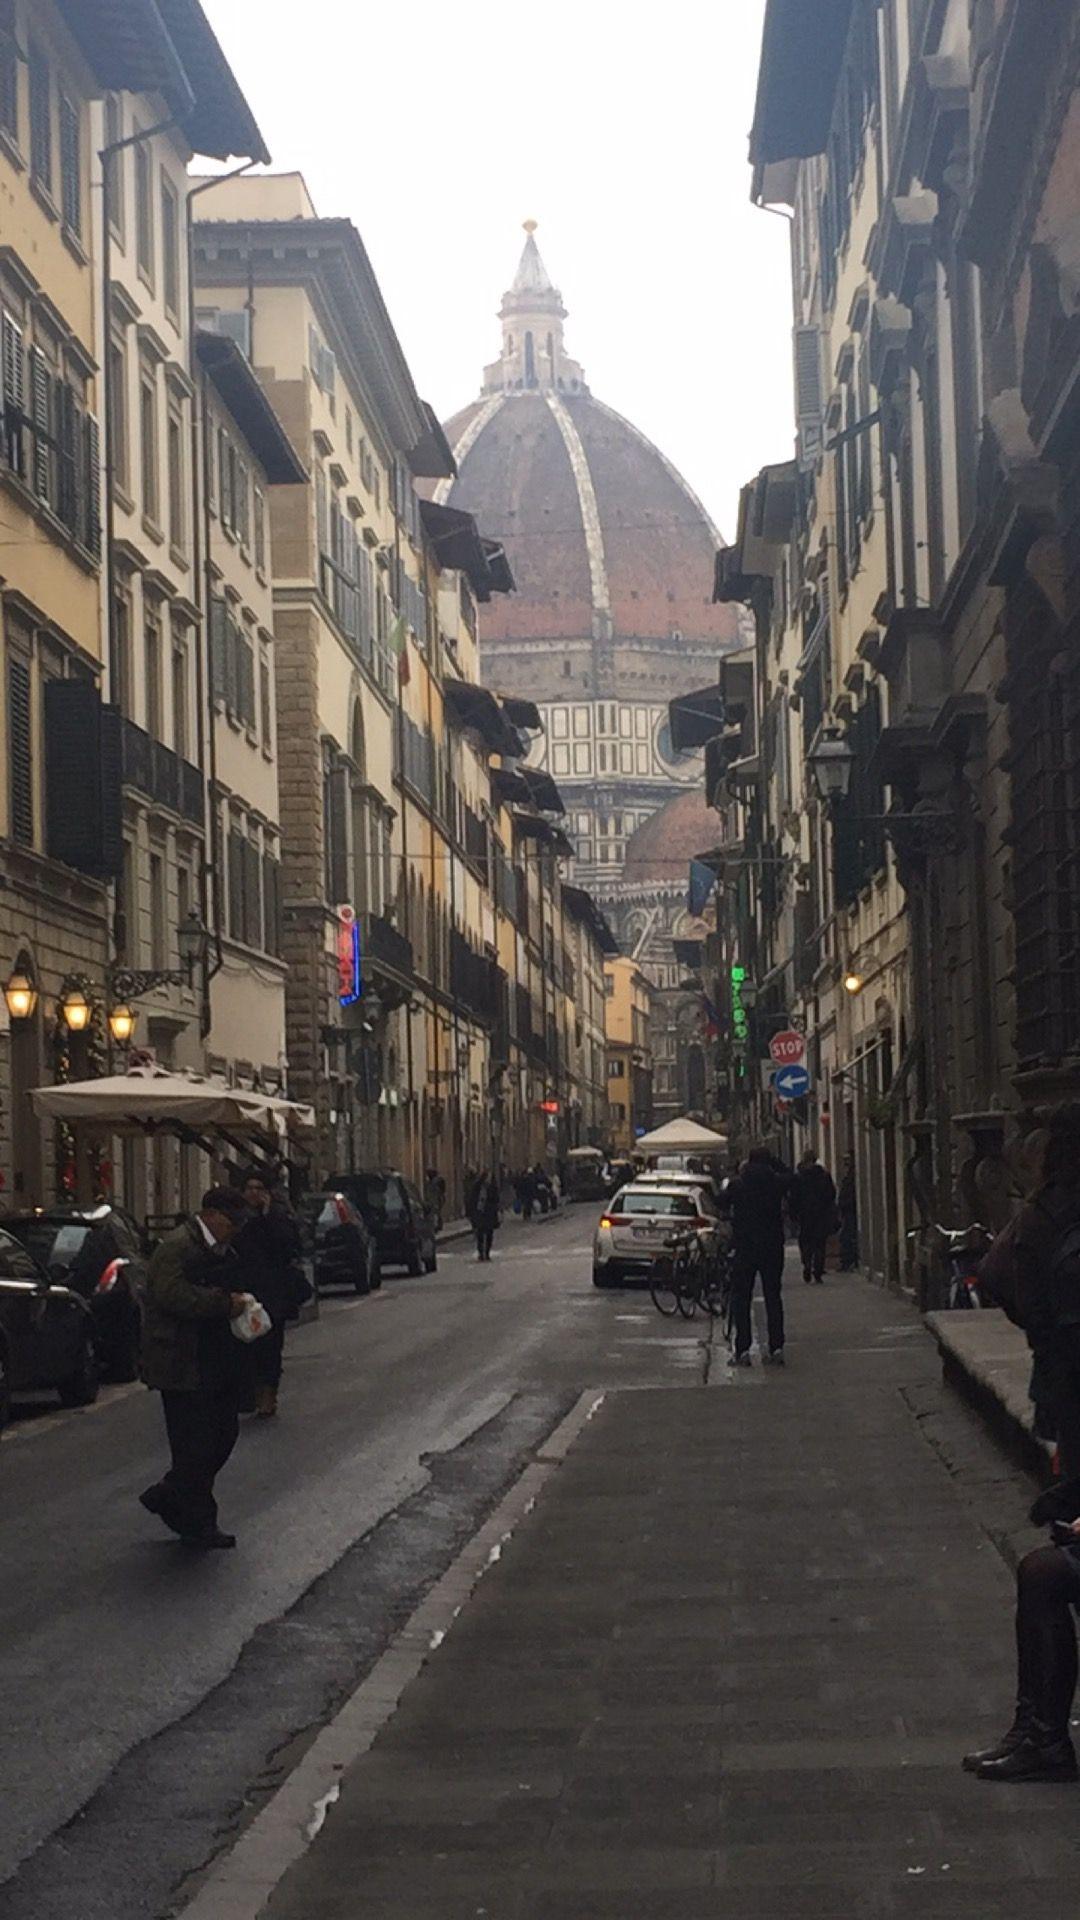 Florence scenes street view views